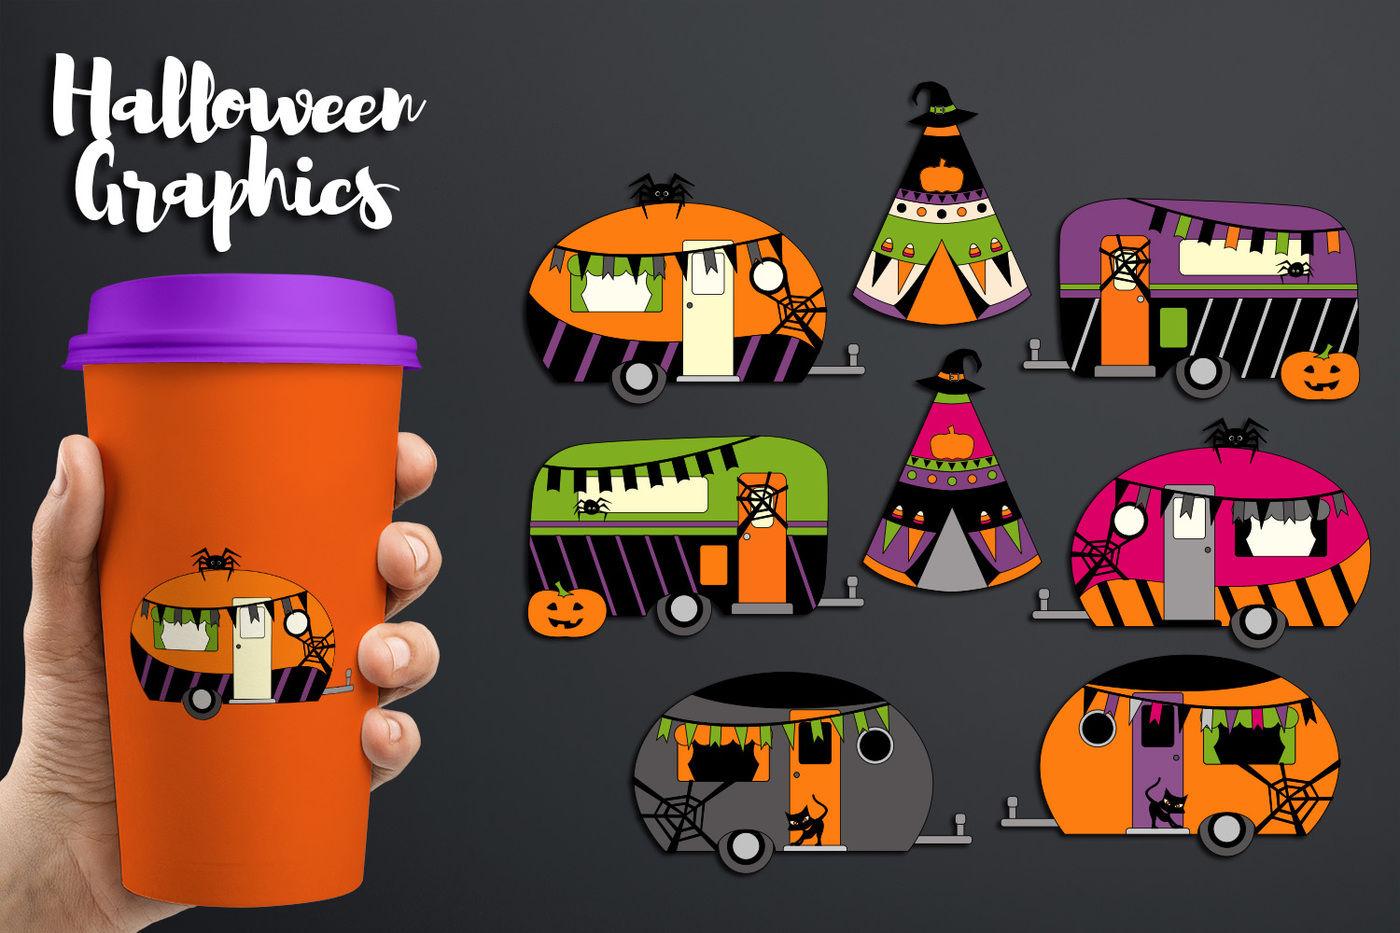 Image rv off we go clipart jpg freeuse library Camper Caravan RV Clip art, Halloween graphics By ... jpg freeuse library